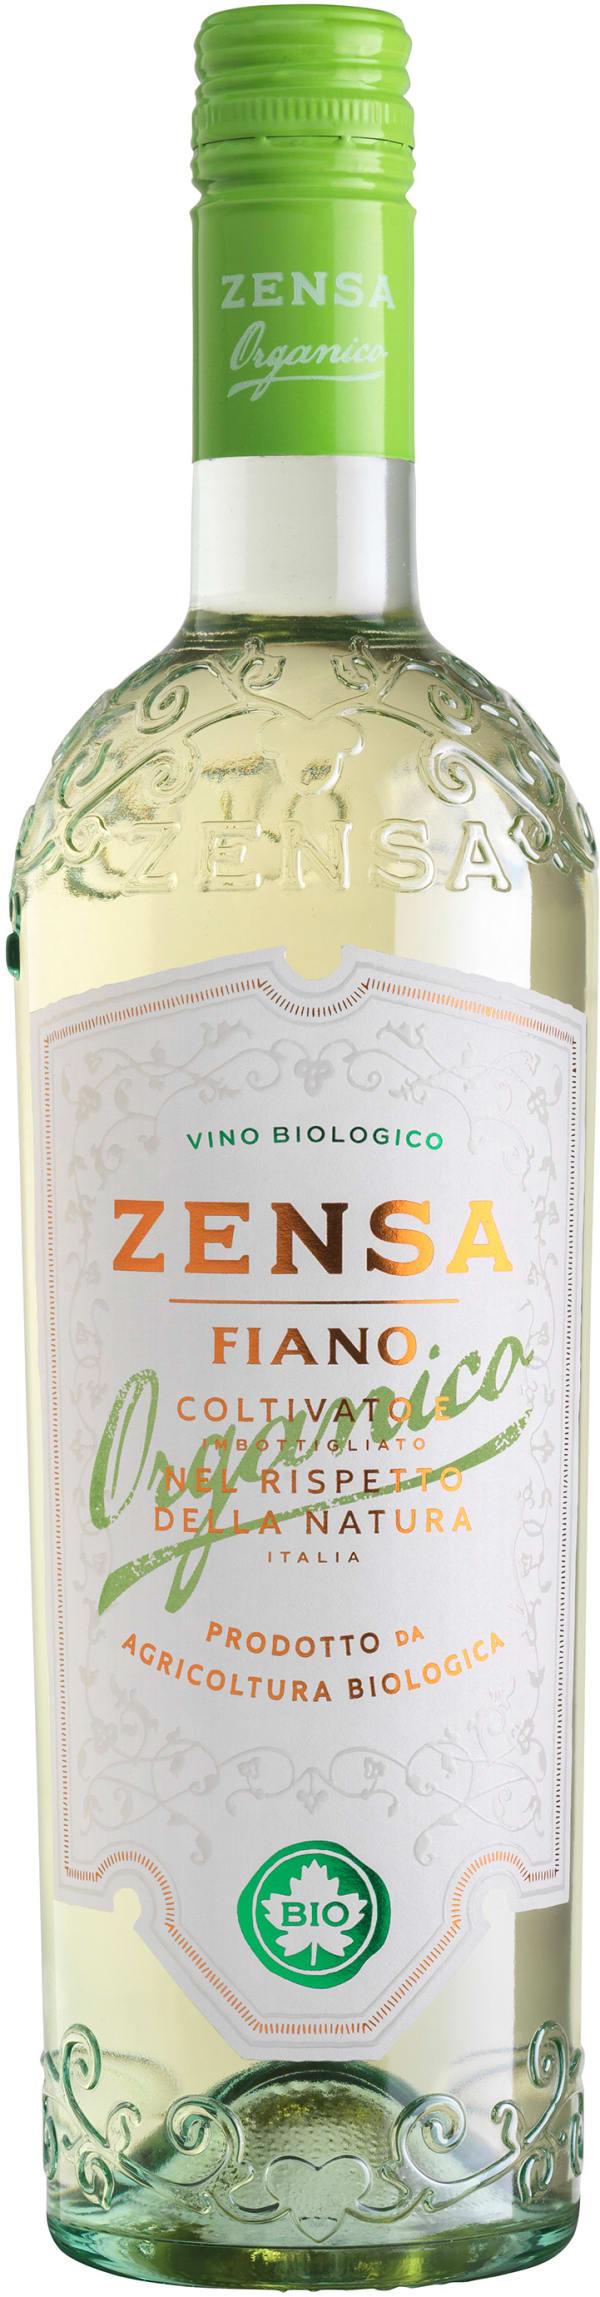 Zensa Fiano Organico 2018